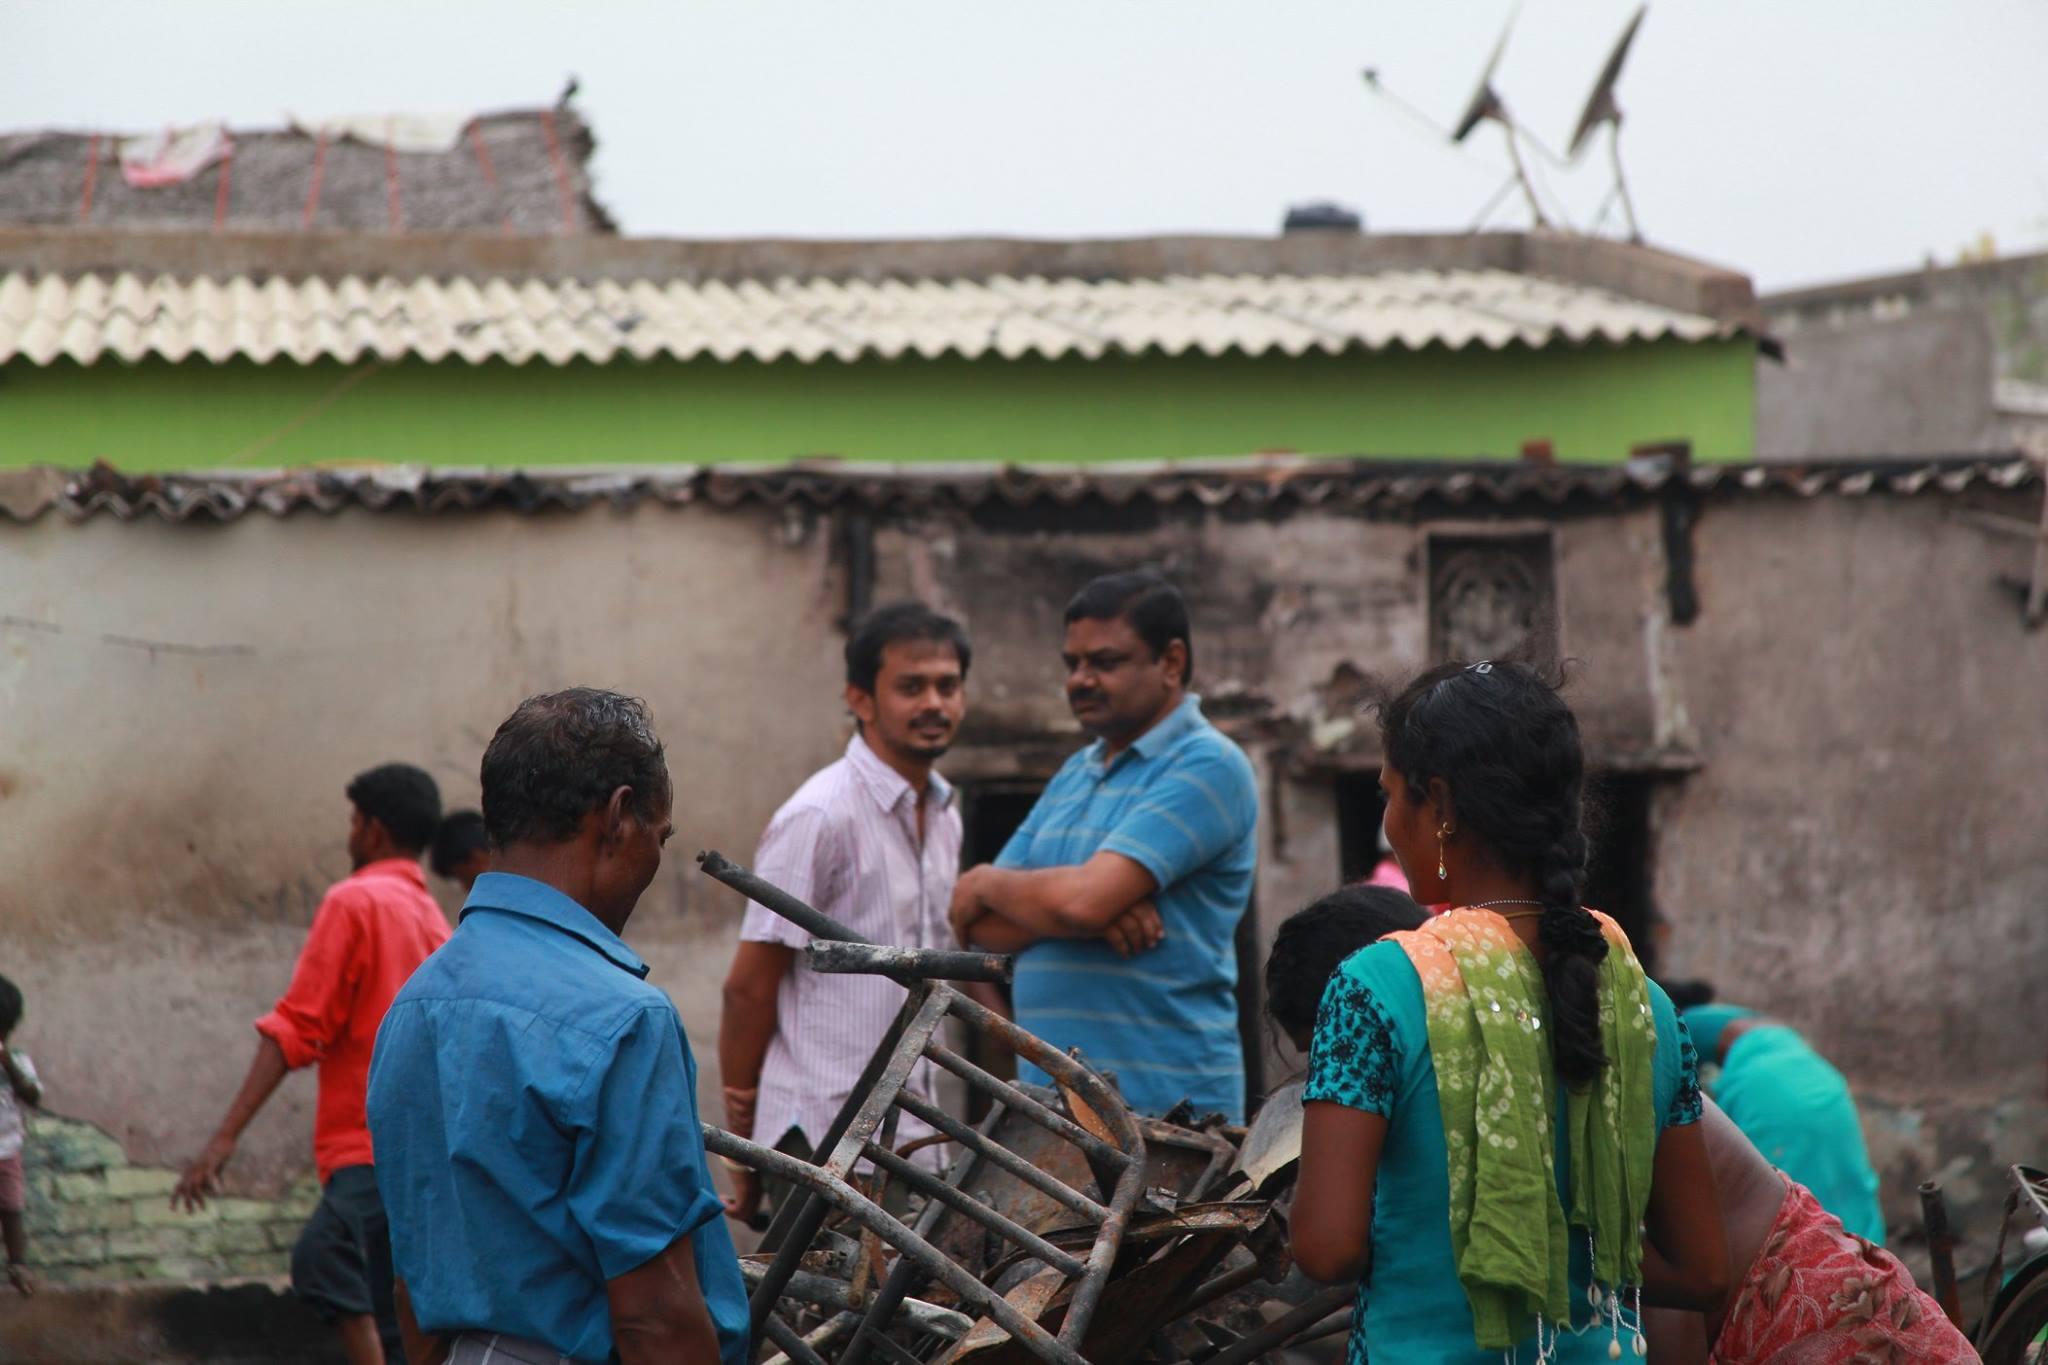 besant-nagar-huts-fire3  பெசன்ட் நகர் குடிசைப்பகுதியில் தீவிபத்து – நாம் தமிழர் கட்சியினர் நேரில் சந்தித்து ஆறுதல் besant nagar huts fire3